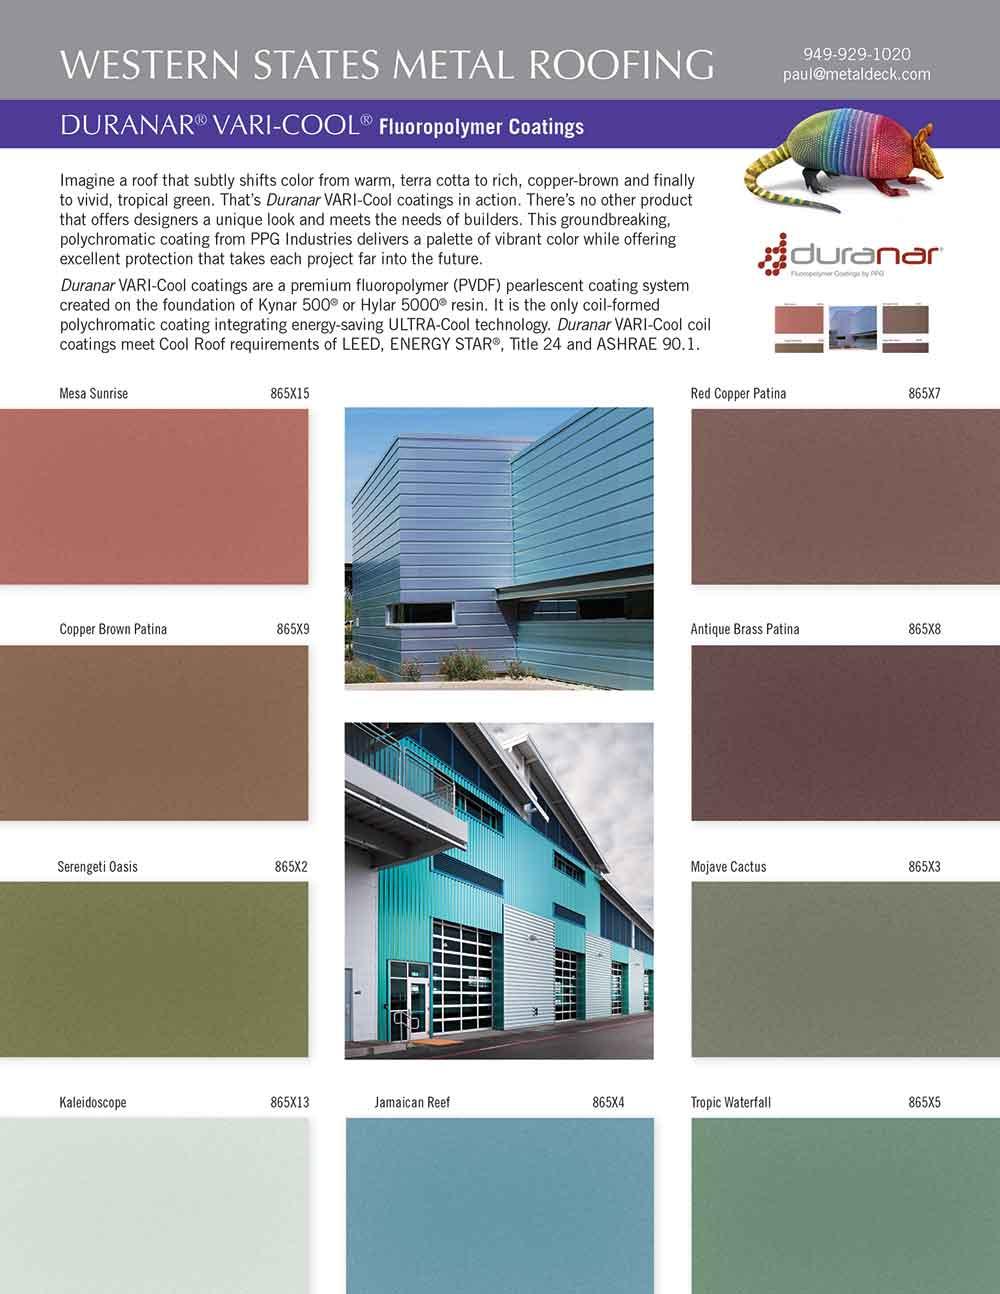 https://f.hubspotusercontent30.net/hubfs/6069238/images/color-card/varicool-color-card-thumb.jpg